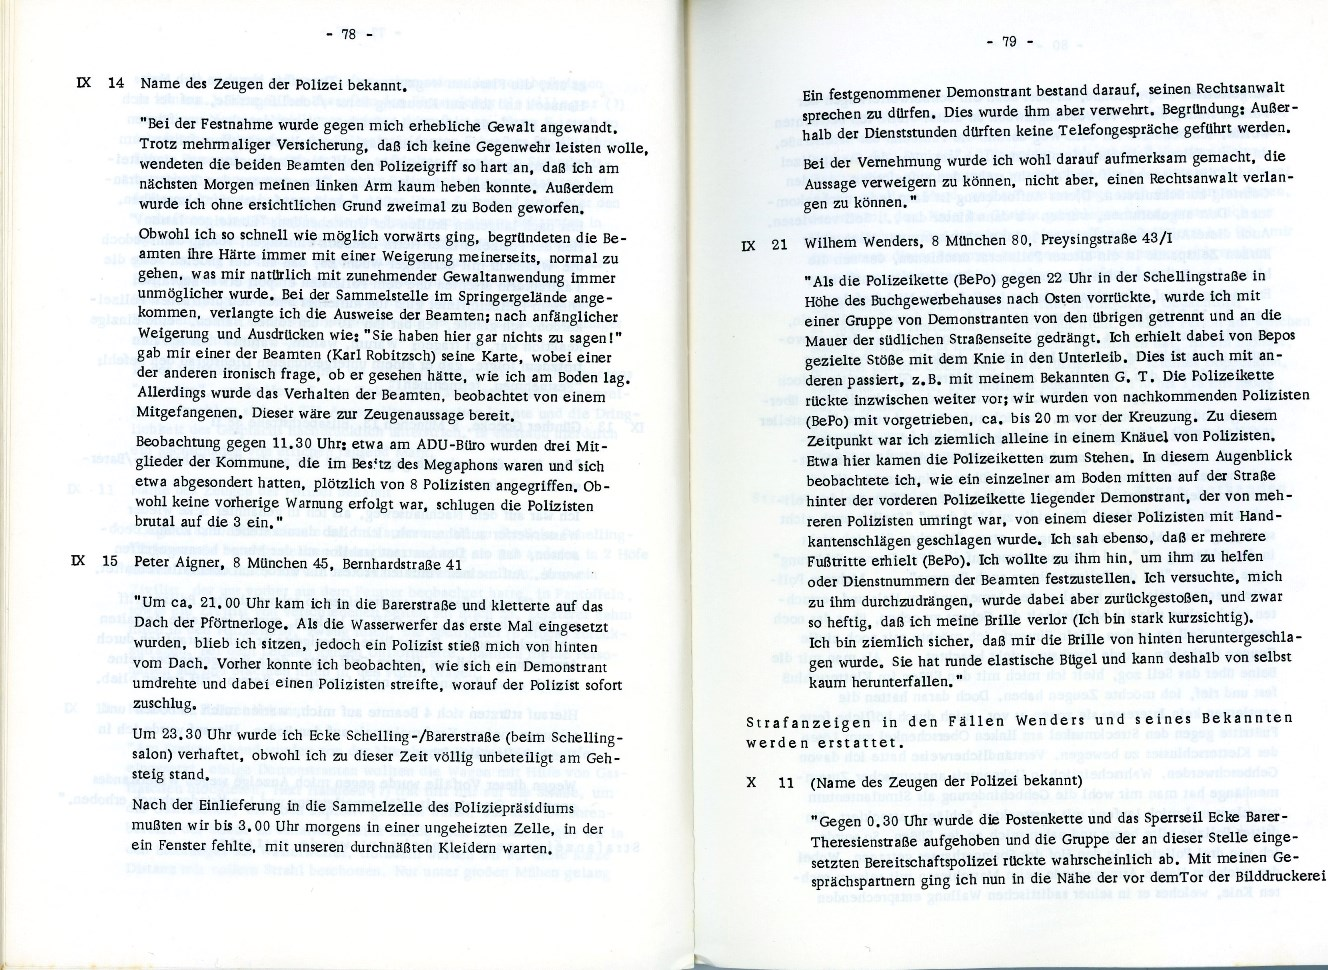 Muenchen_Doku_Osterdemonstrationen_1968_42